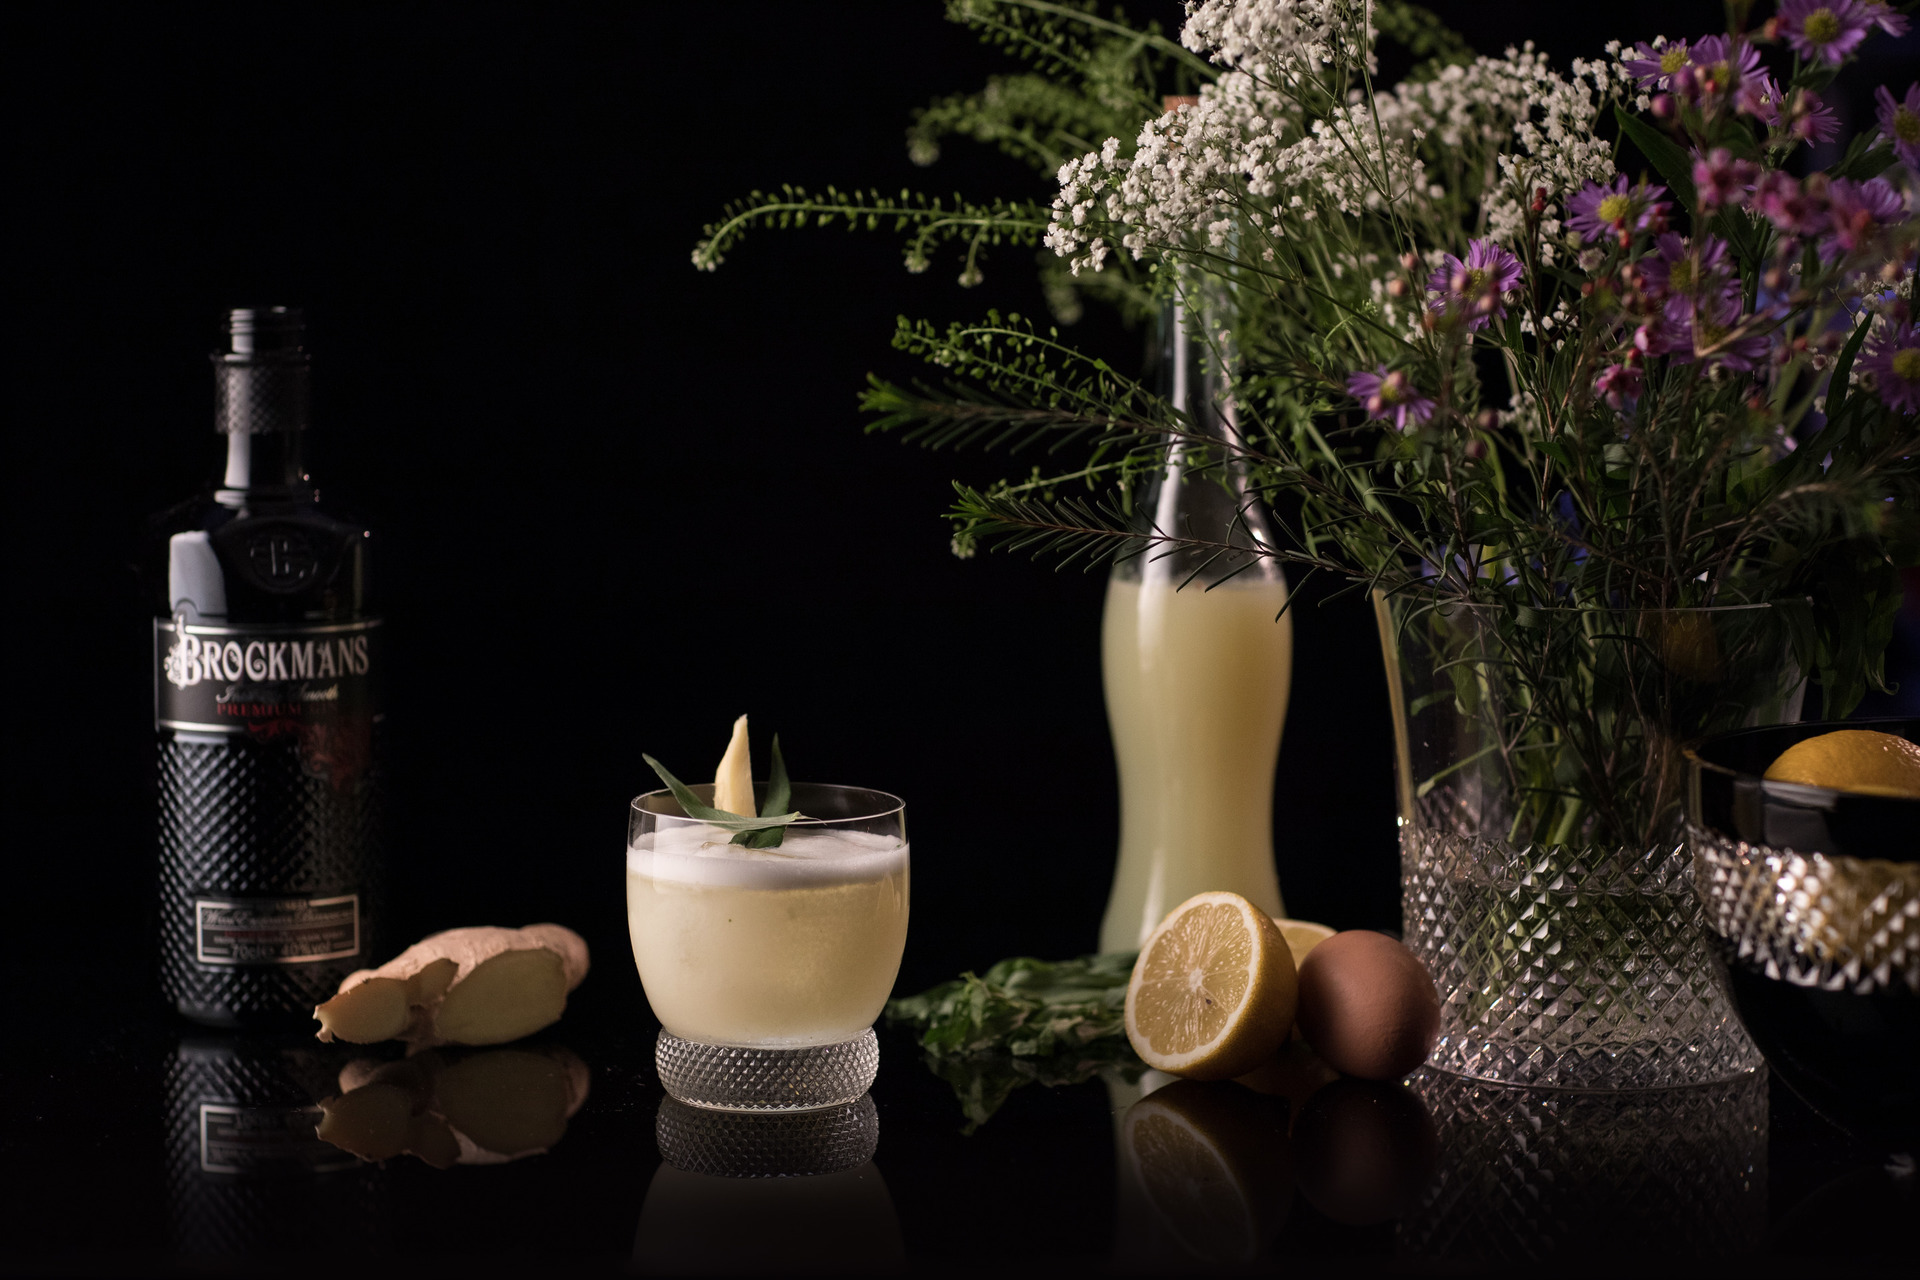 Herbal Sour Brockmans Gin